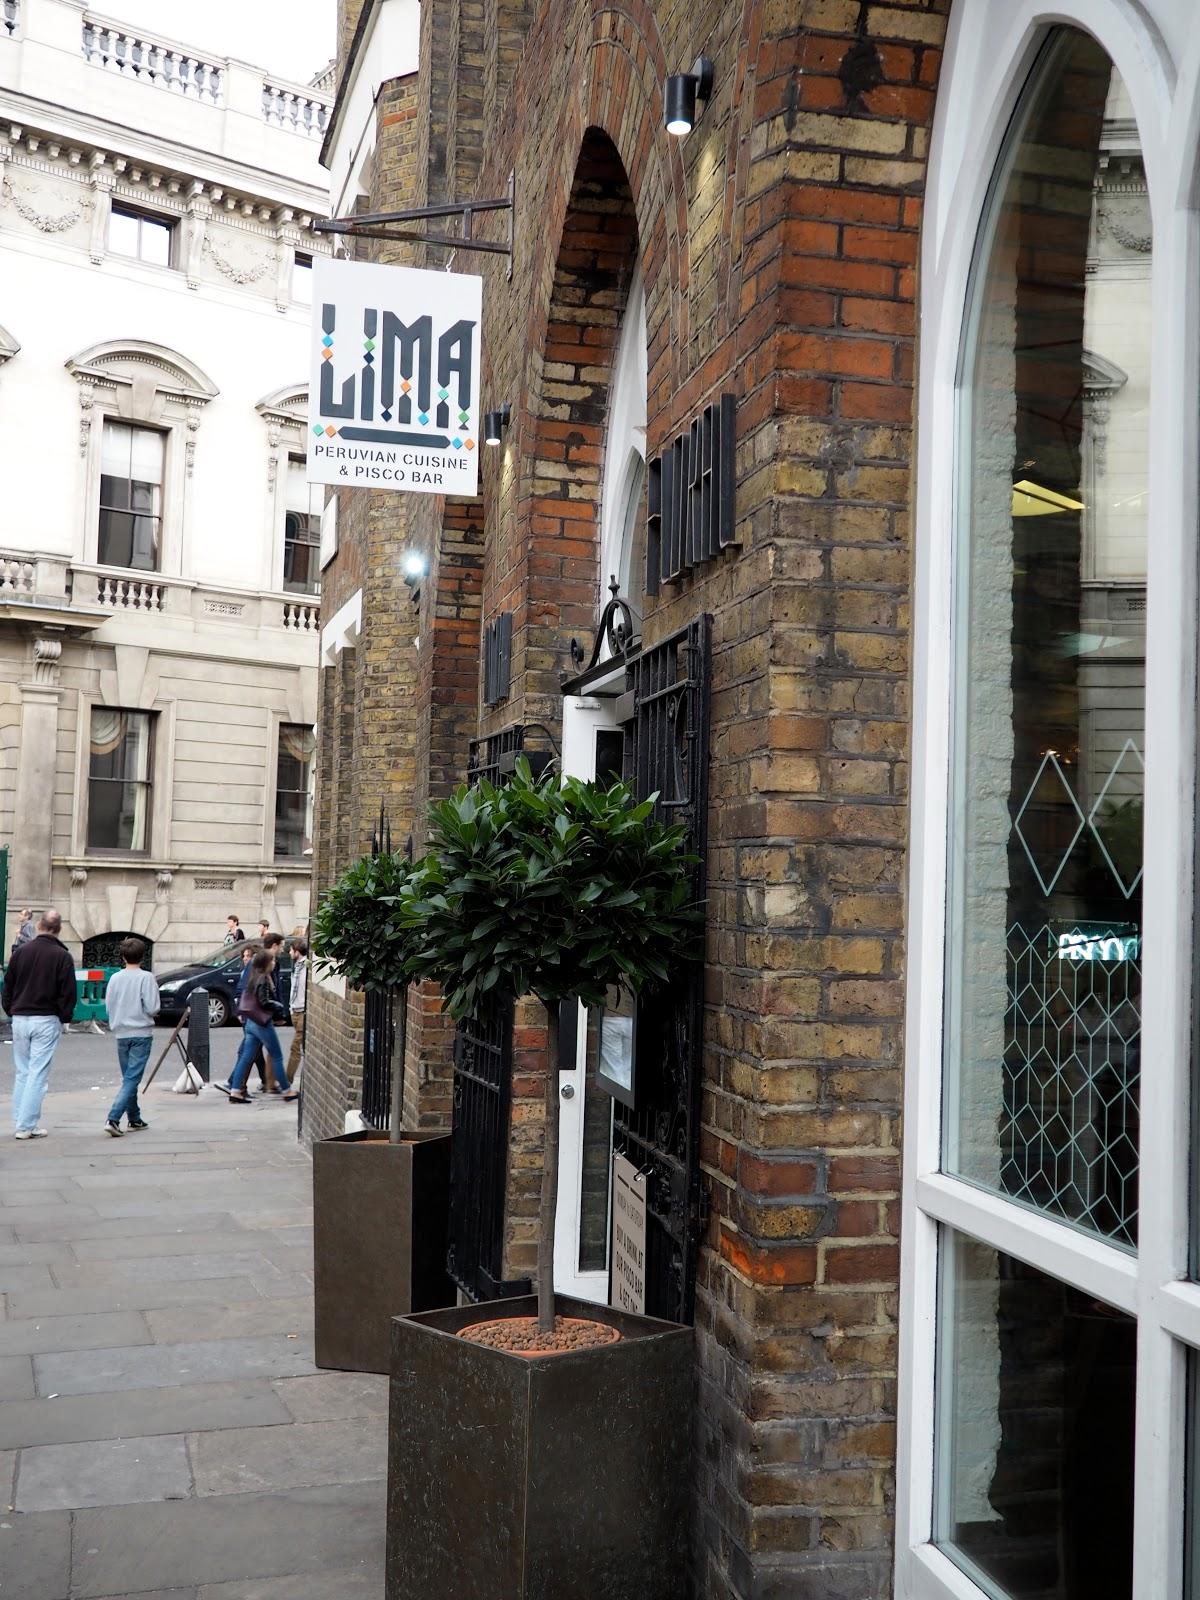 LIMA Floral Peruvian Restaurant London Lunch